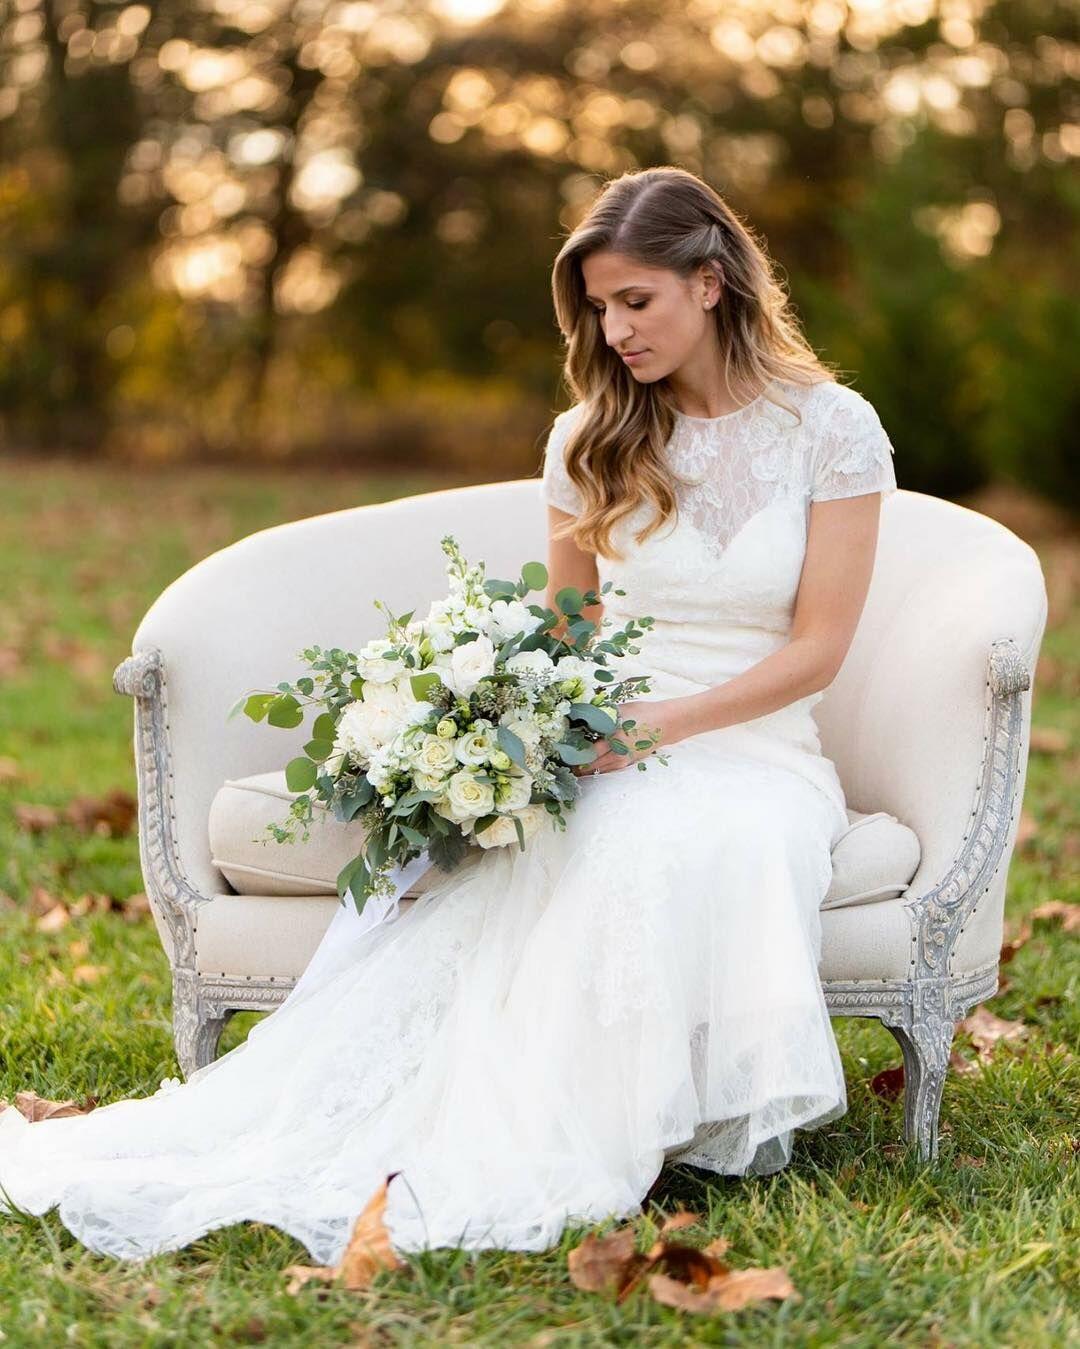 Memory Of Elegance Floral Design Florists Murfreesboro Tn